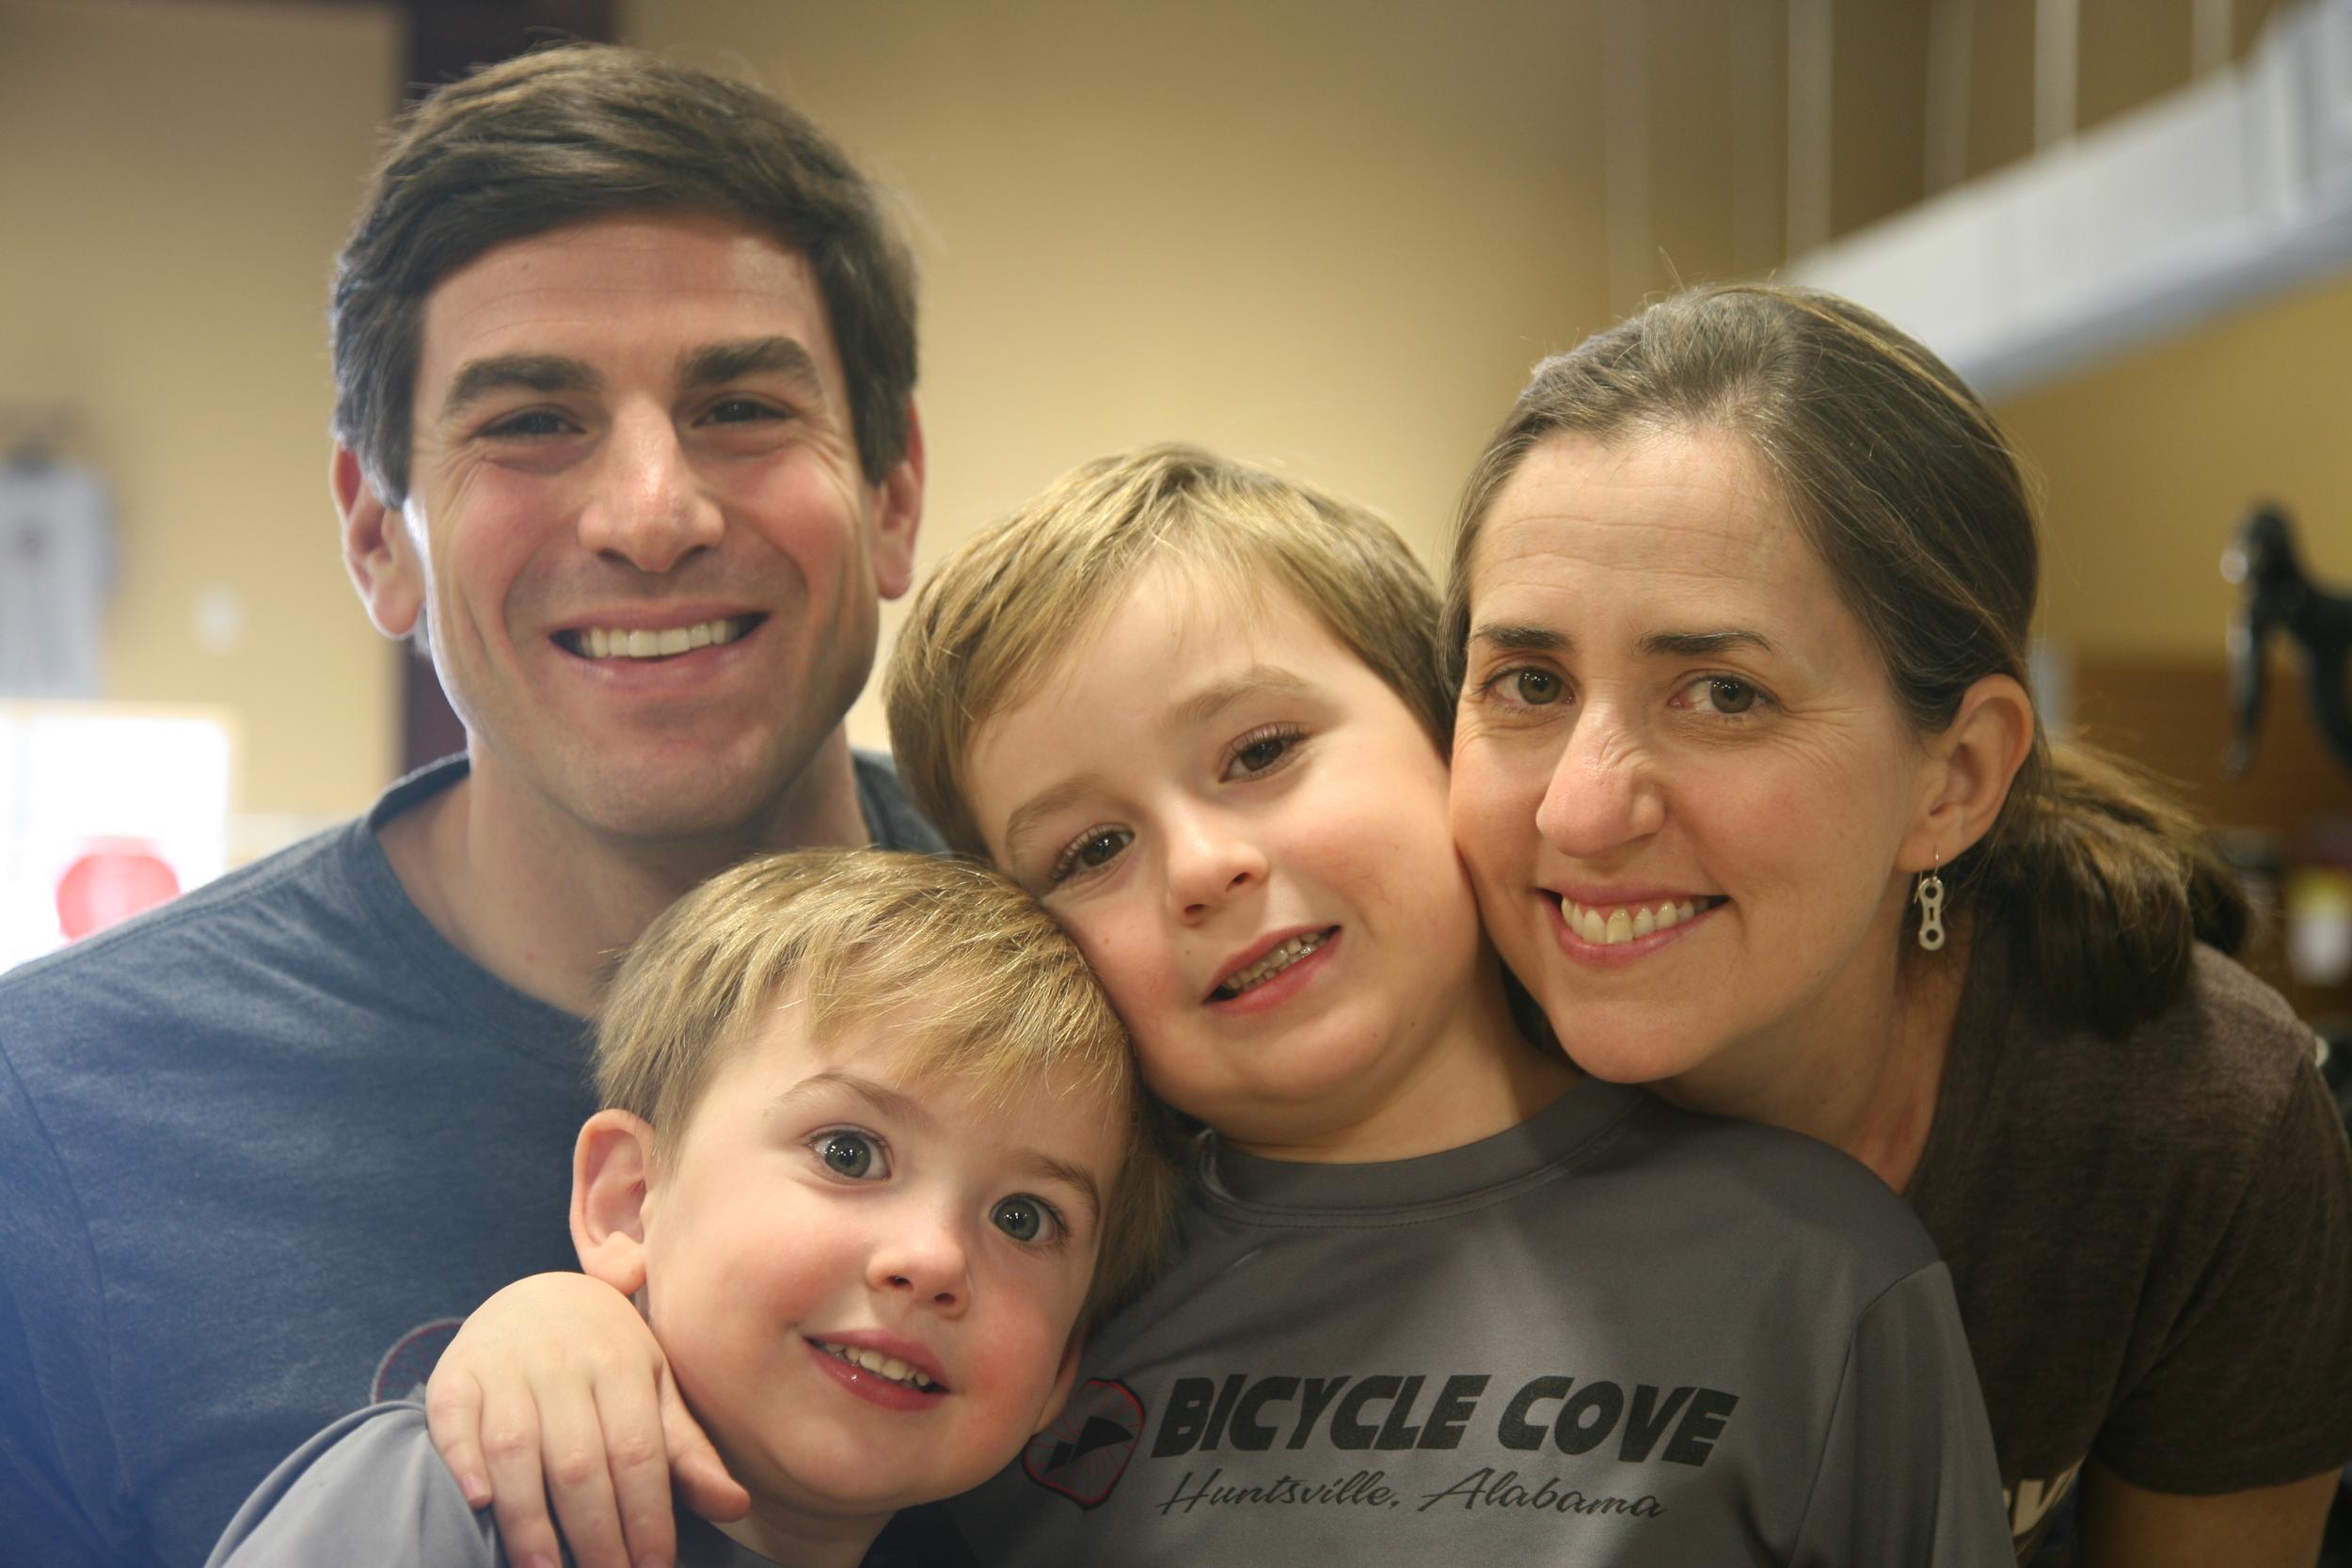 Chris, Jacob, Max and Jessica